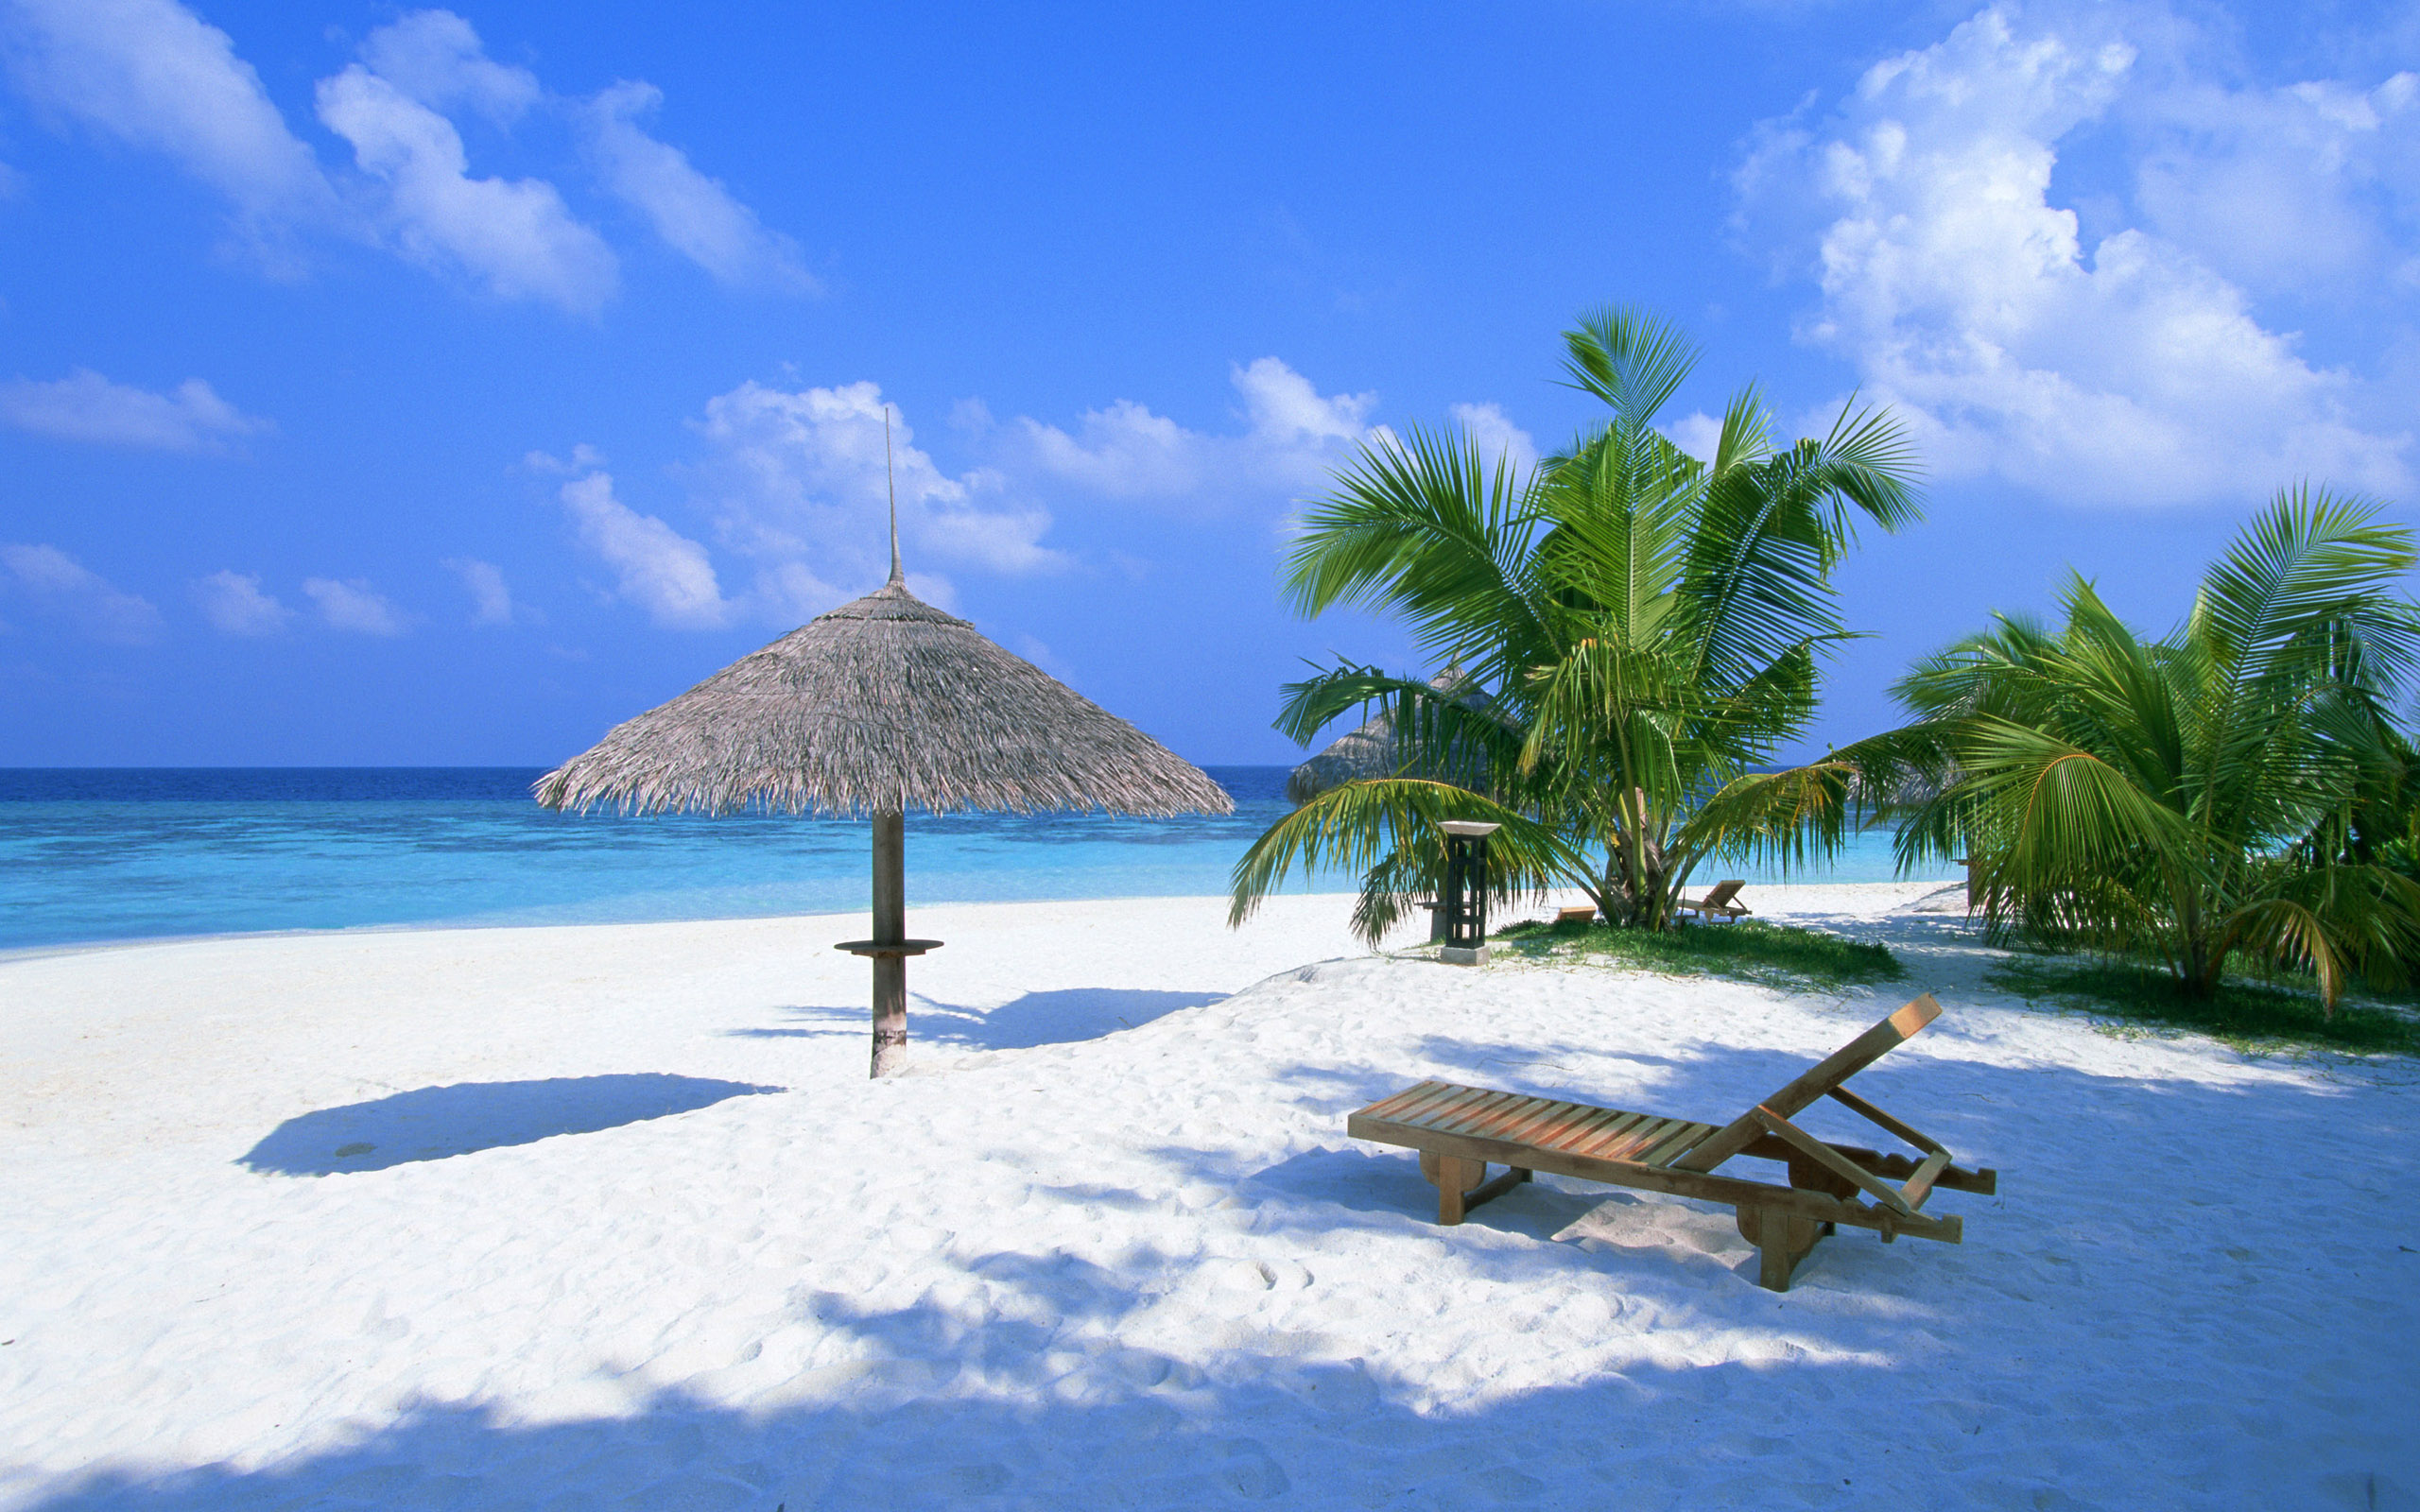 Maldives Island Desktop Backgrounds Maldives Island Desktop 2560x1600